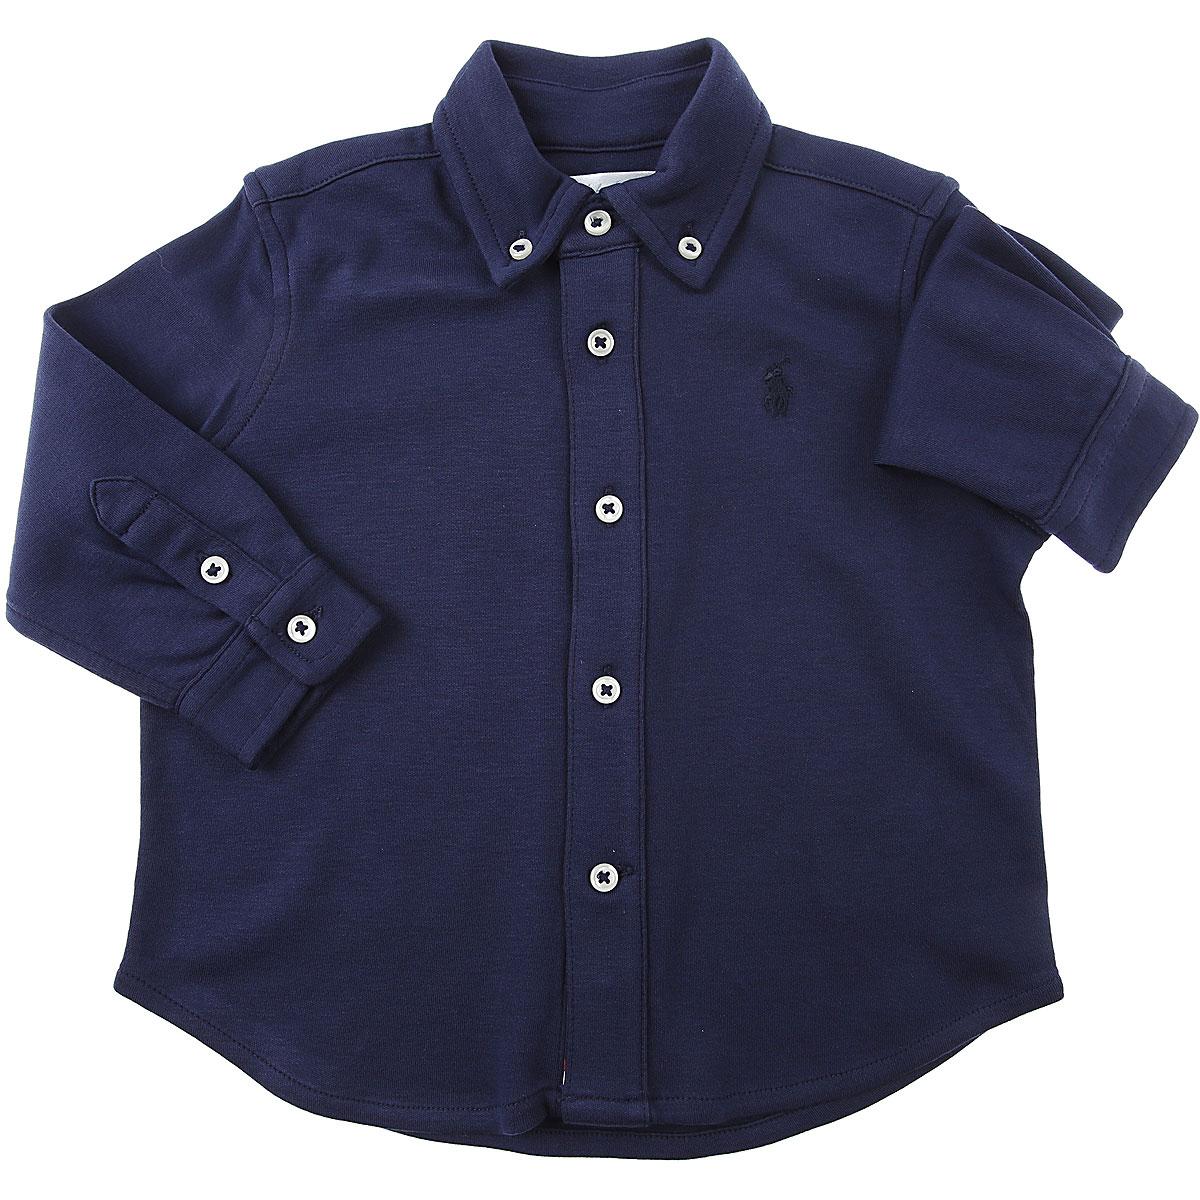 Ralph Lauren Baby Shirts for Boys On Sale, Blue, Cotton, 2019, 12 M 2Y